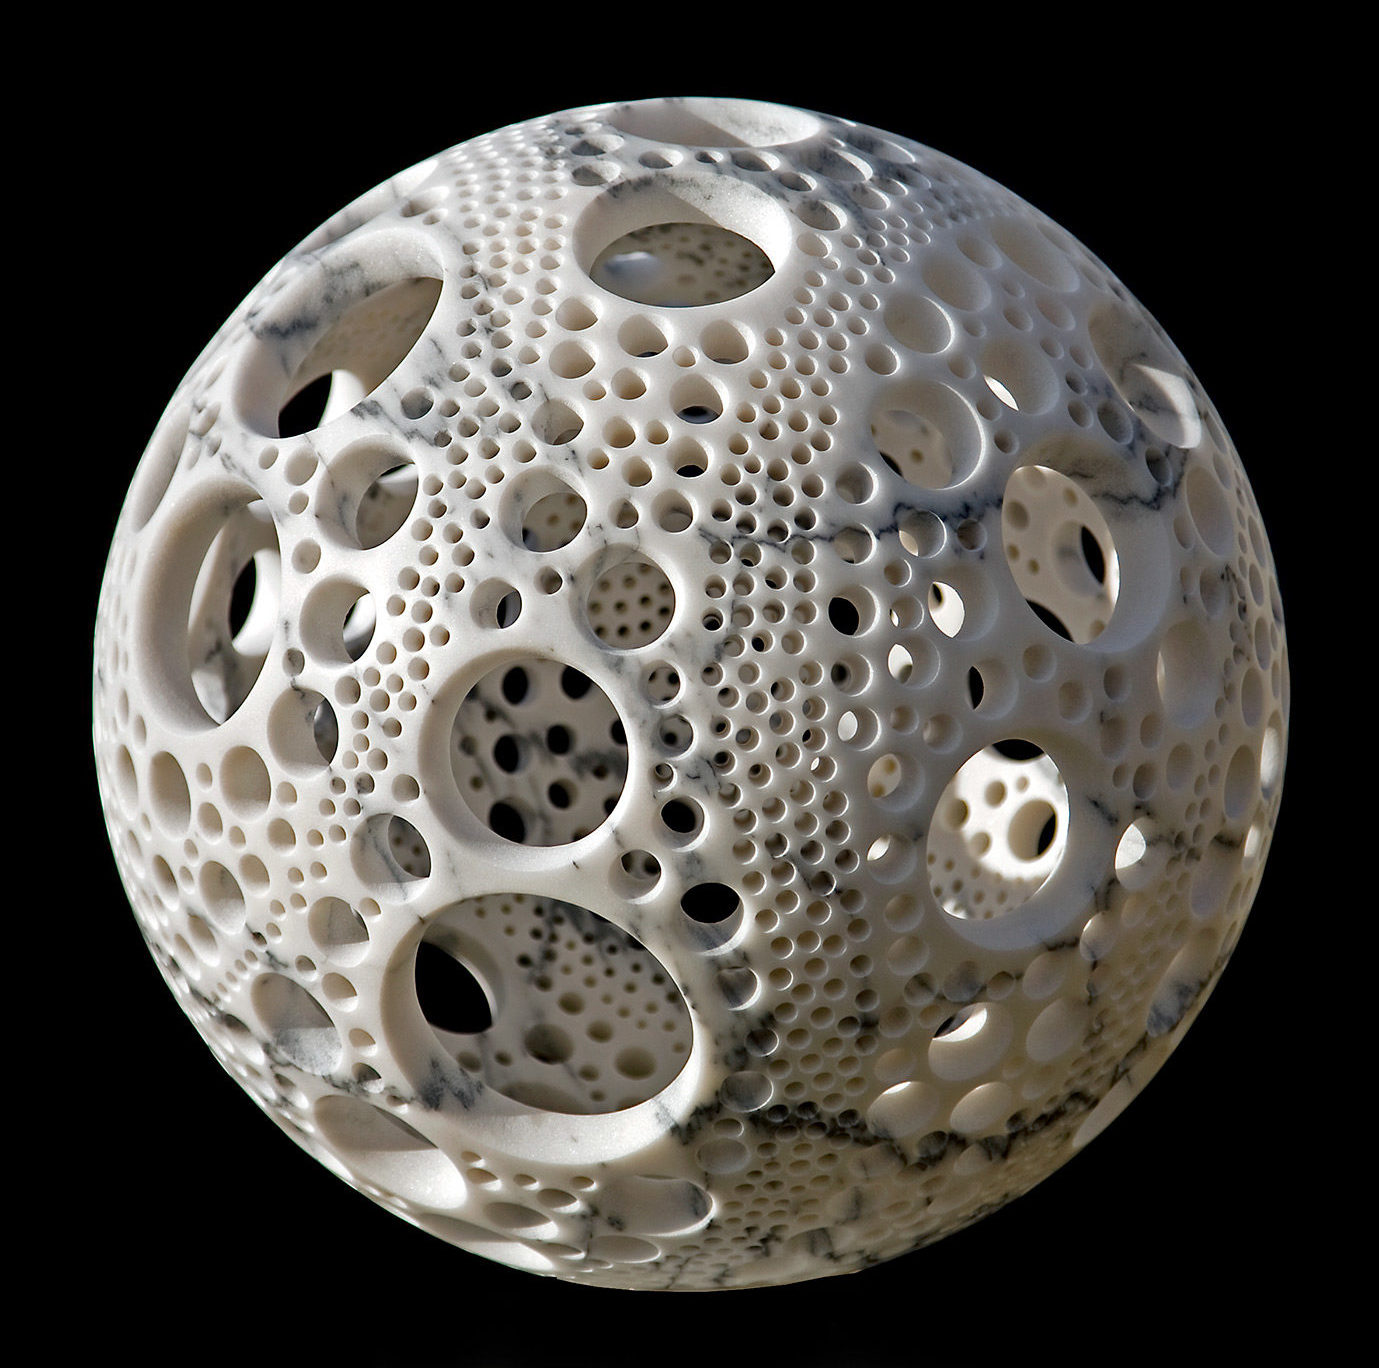 Planet Helix 2